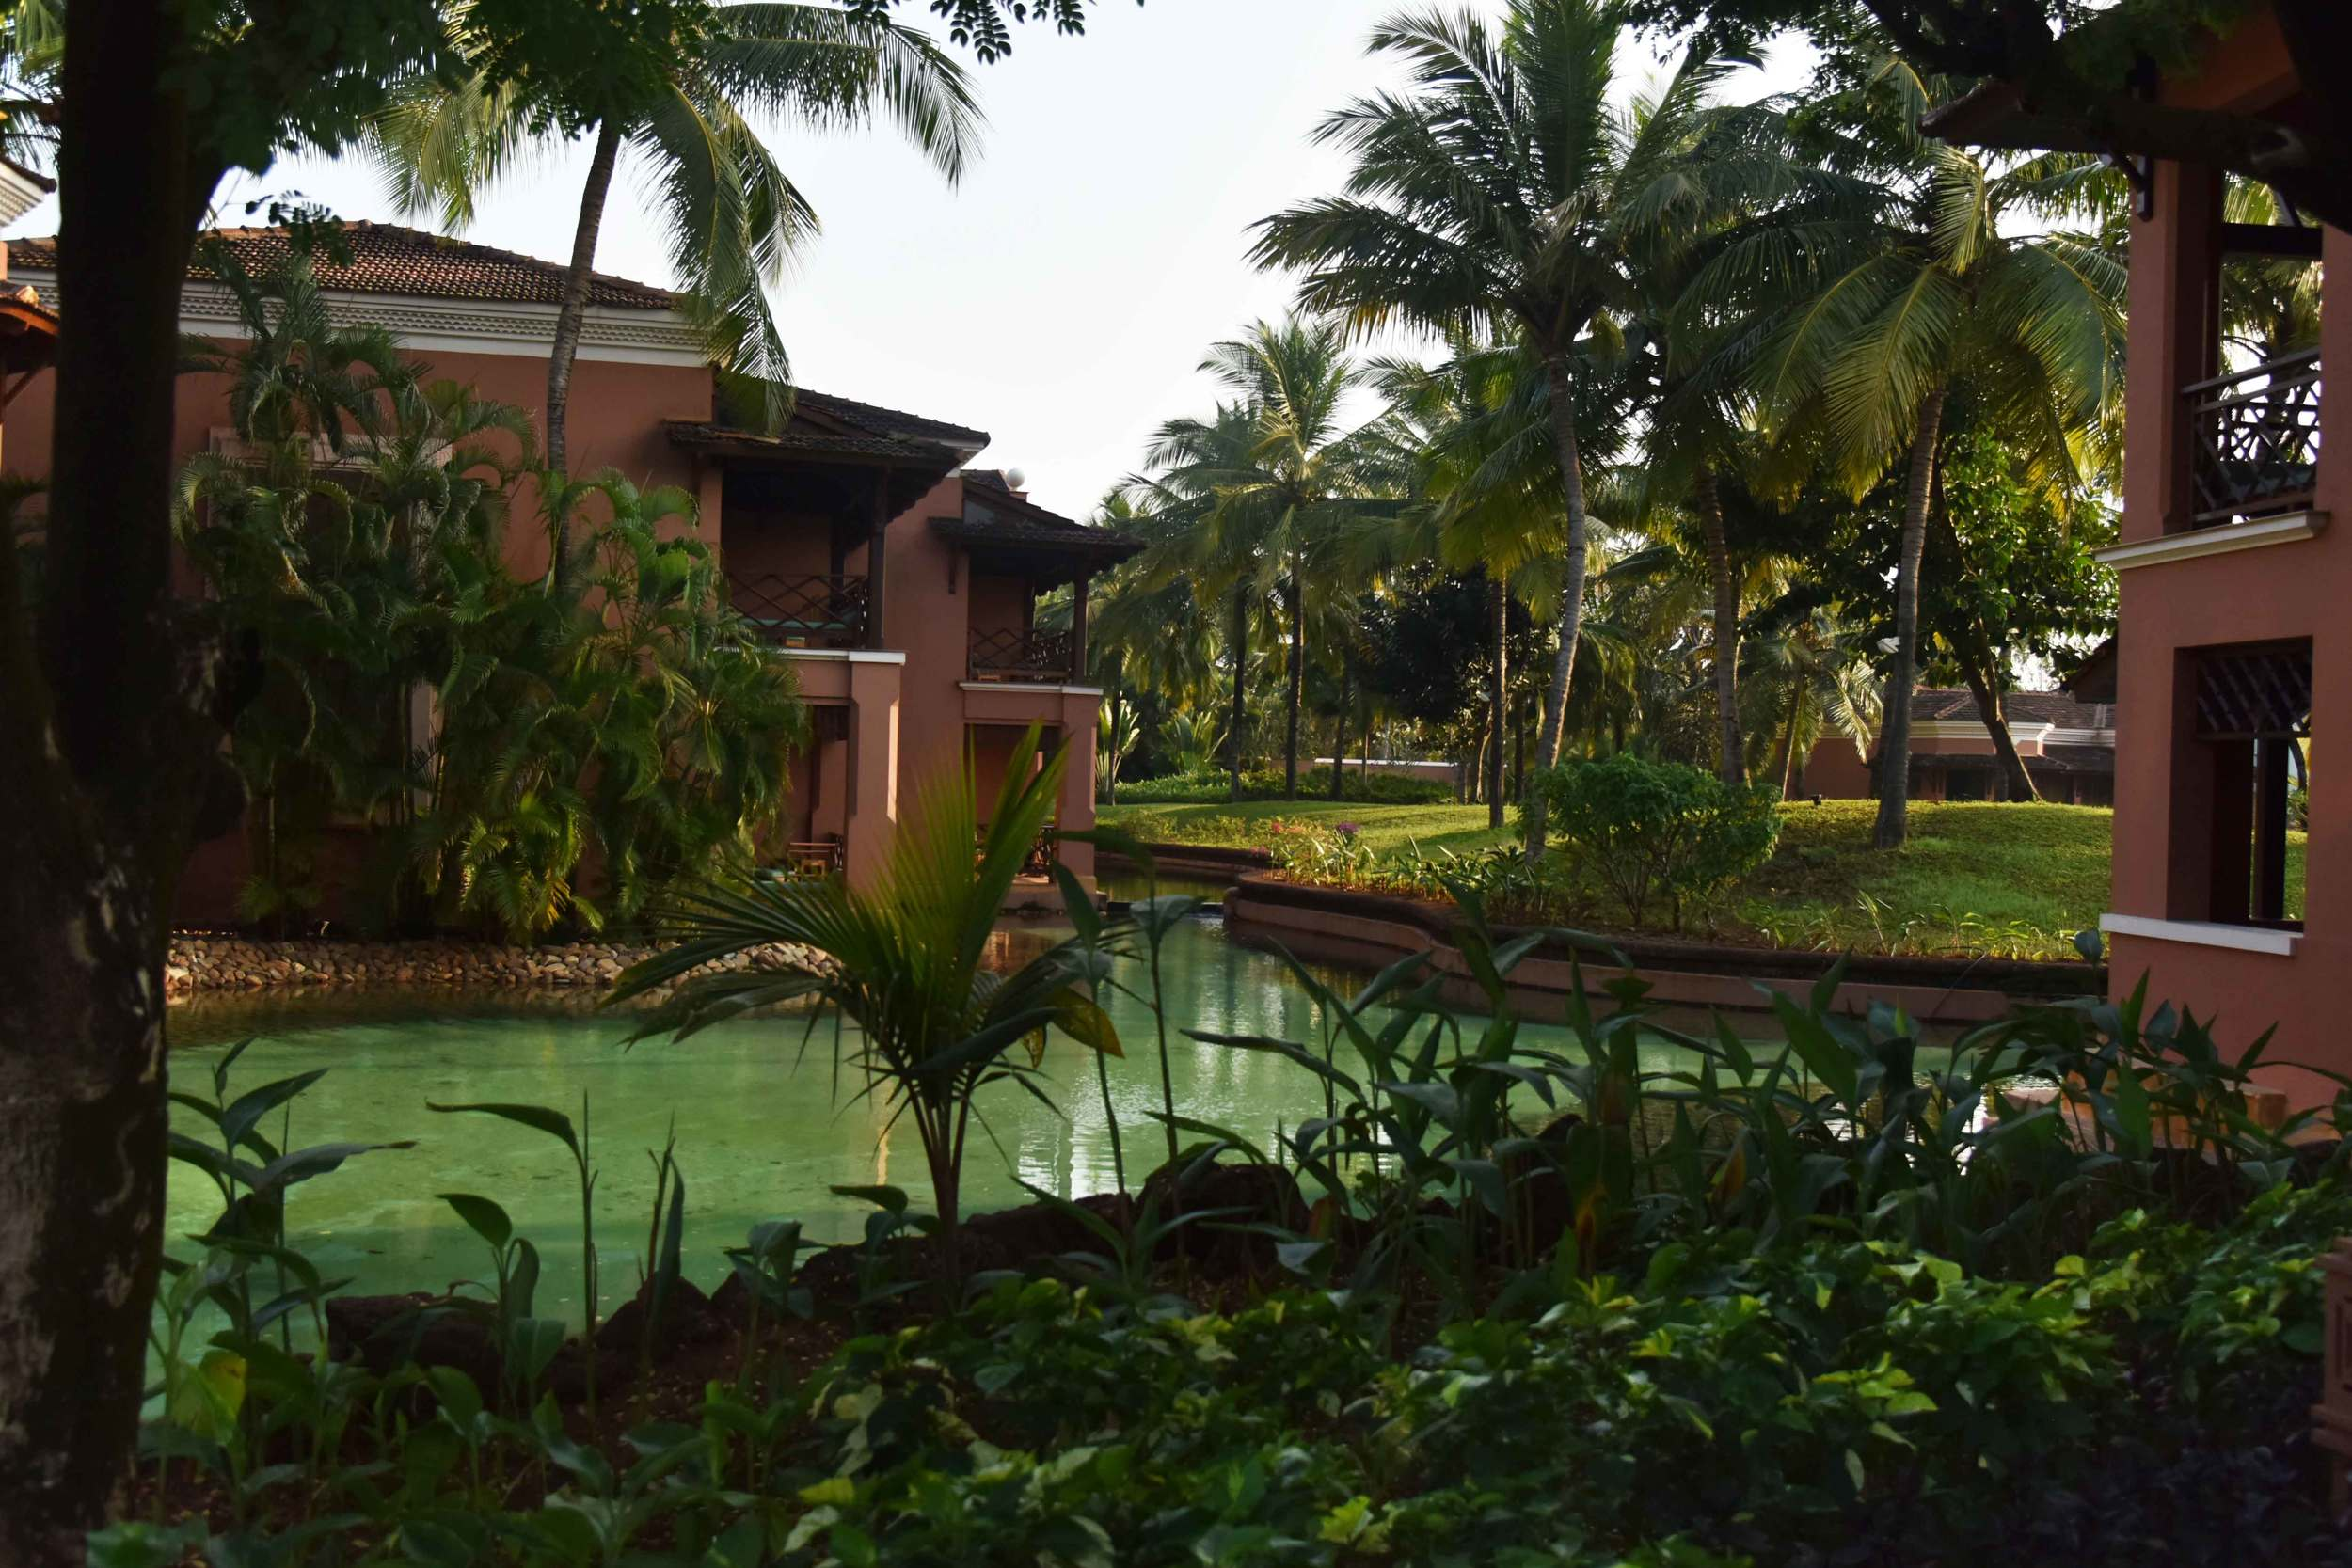 Park Hyatt, Goa, India, beach resort, luxury spa resort. Image©thingstodot.com